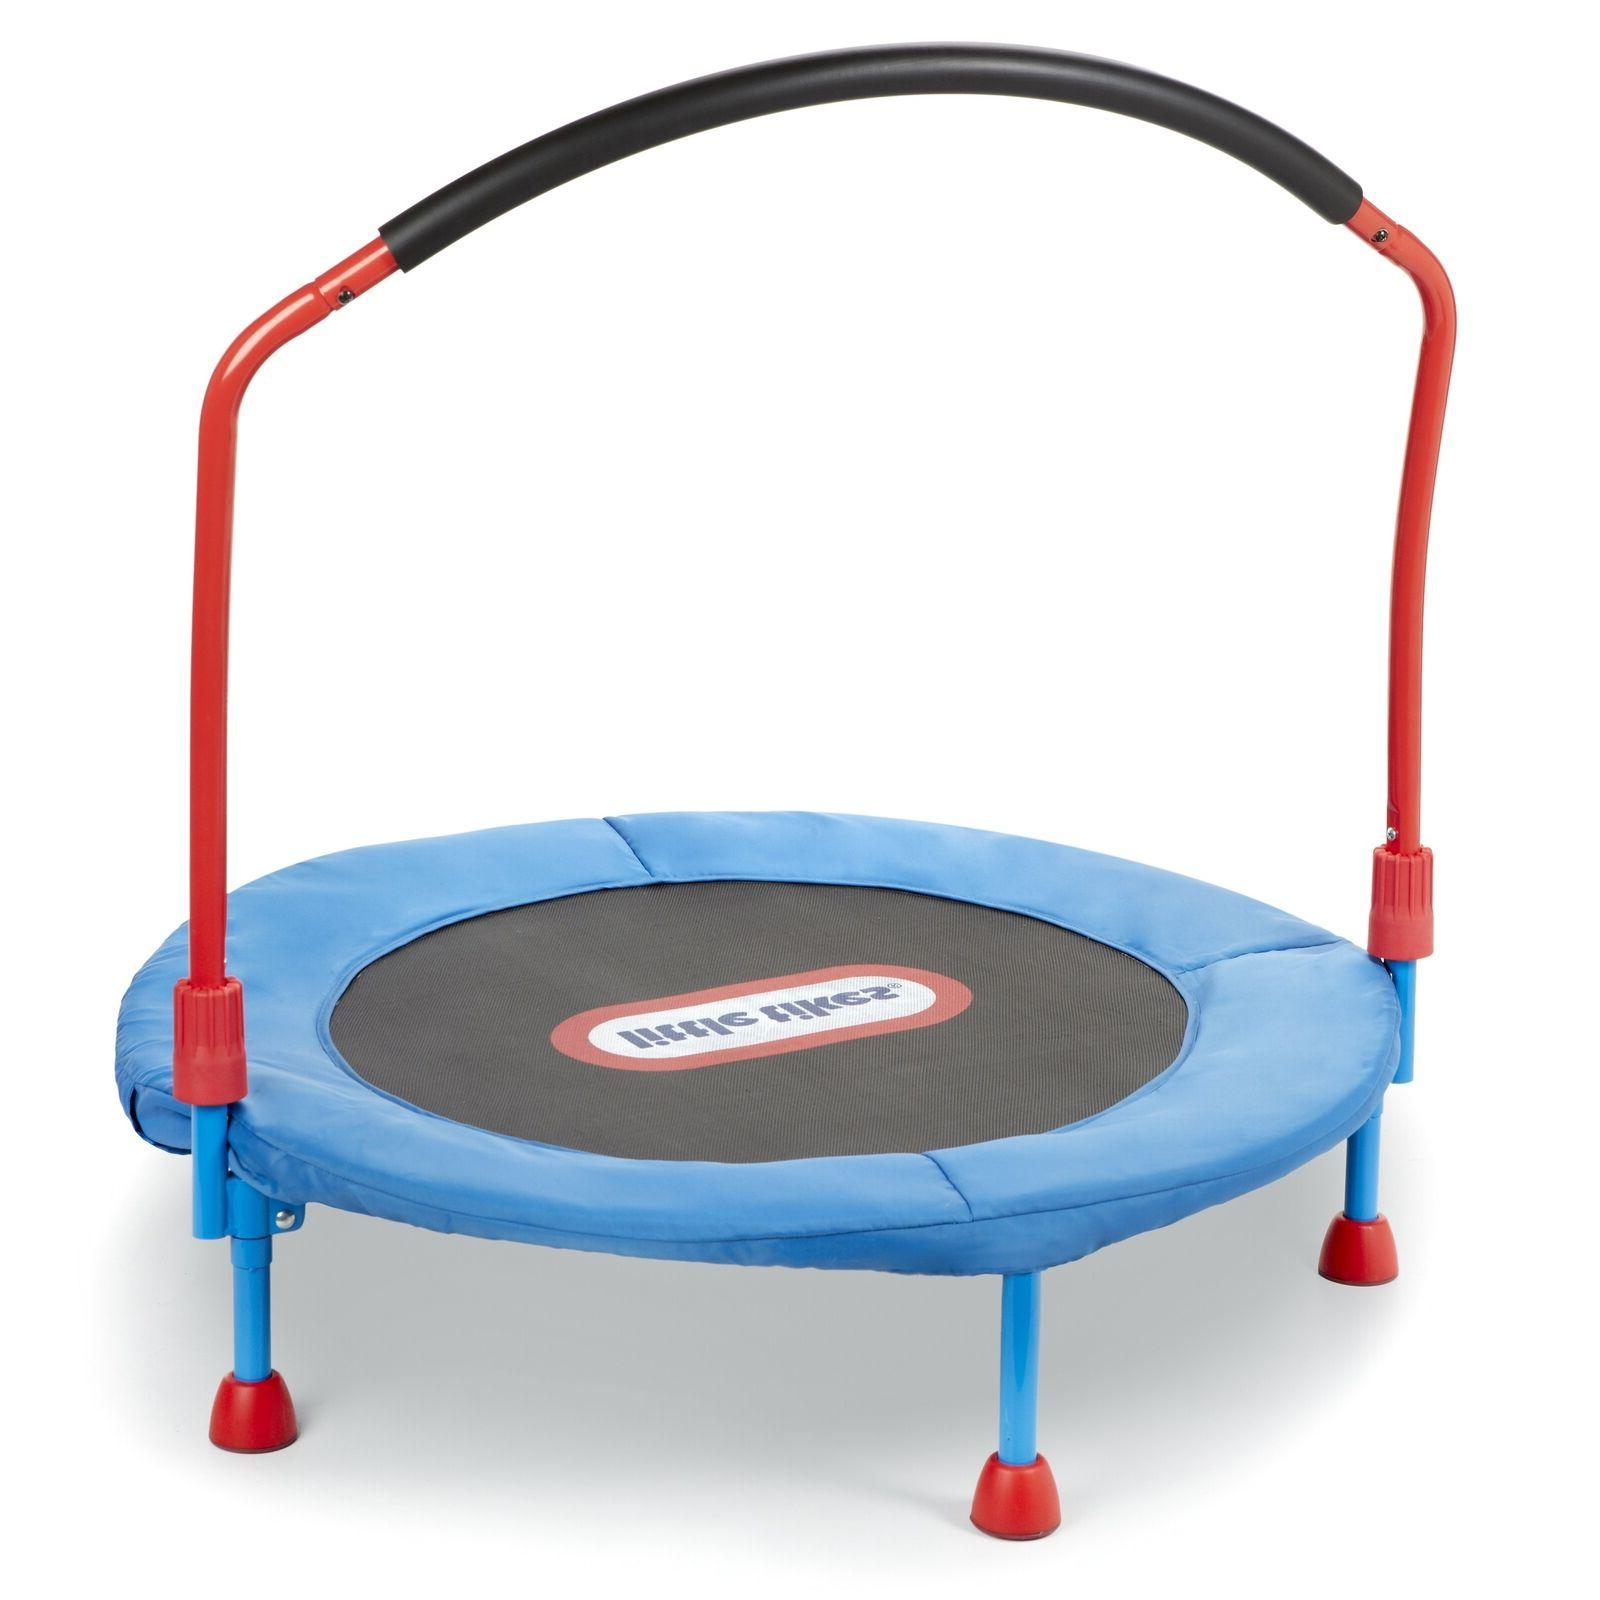 easy store 3 foot trampoline with foam